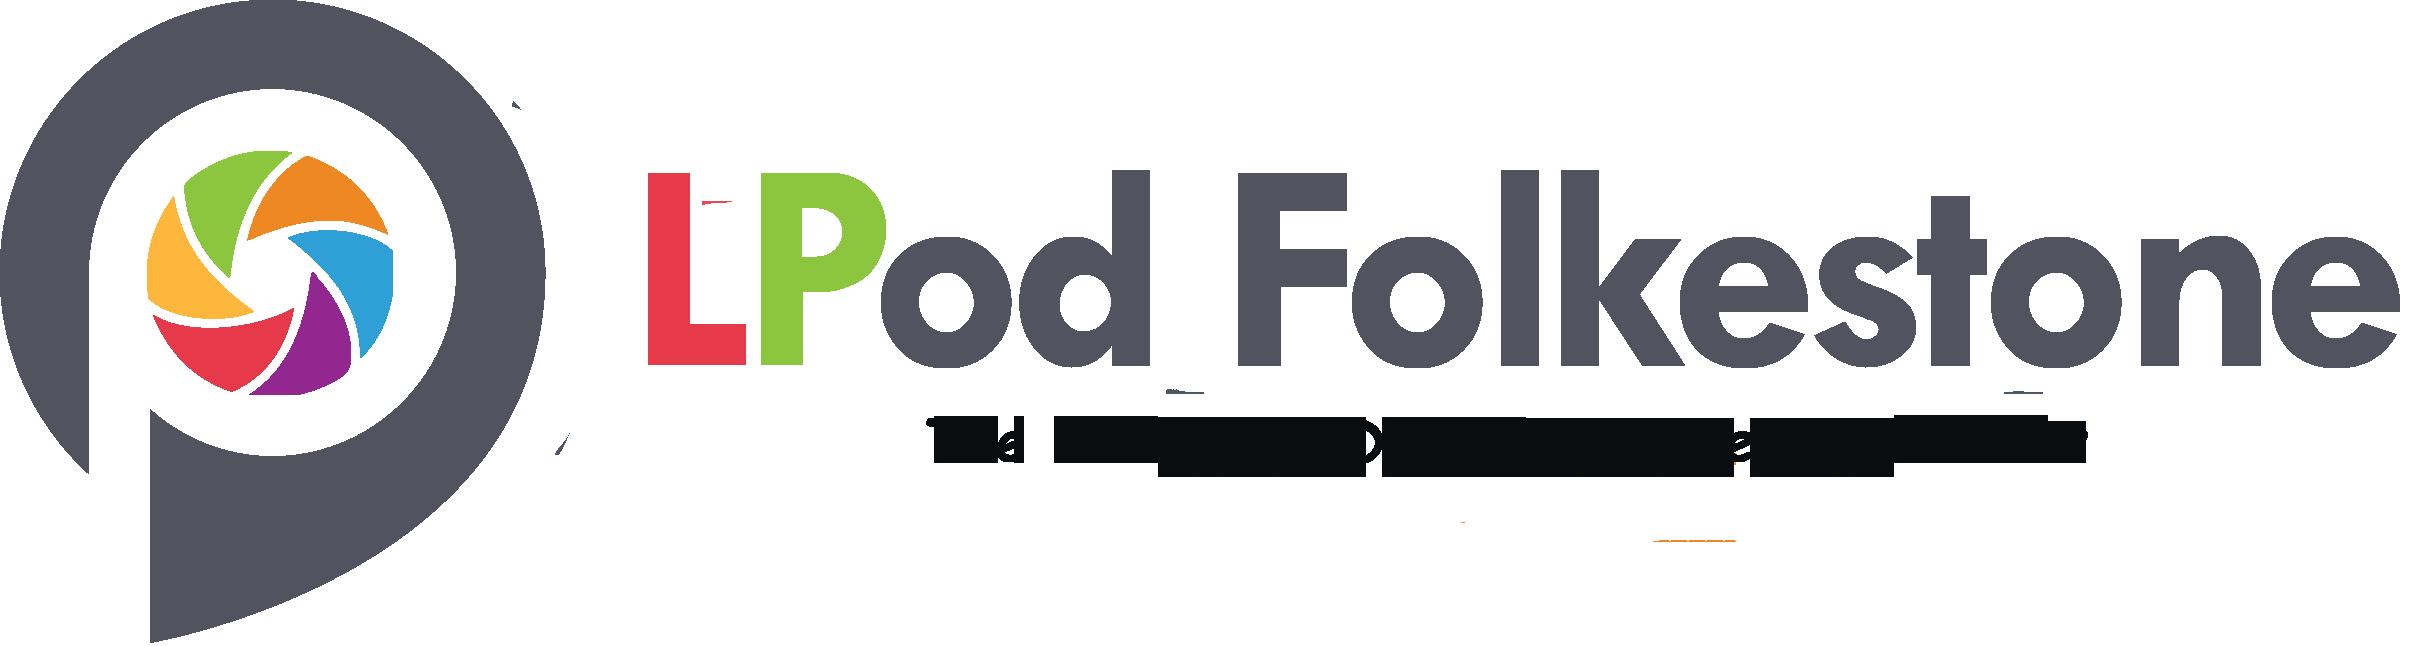 intensive driving courses Folkestone. one week driving courses Folkestone, fast pass driving courses Folkestone